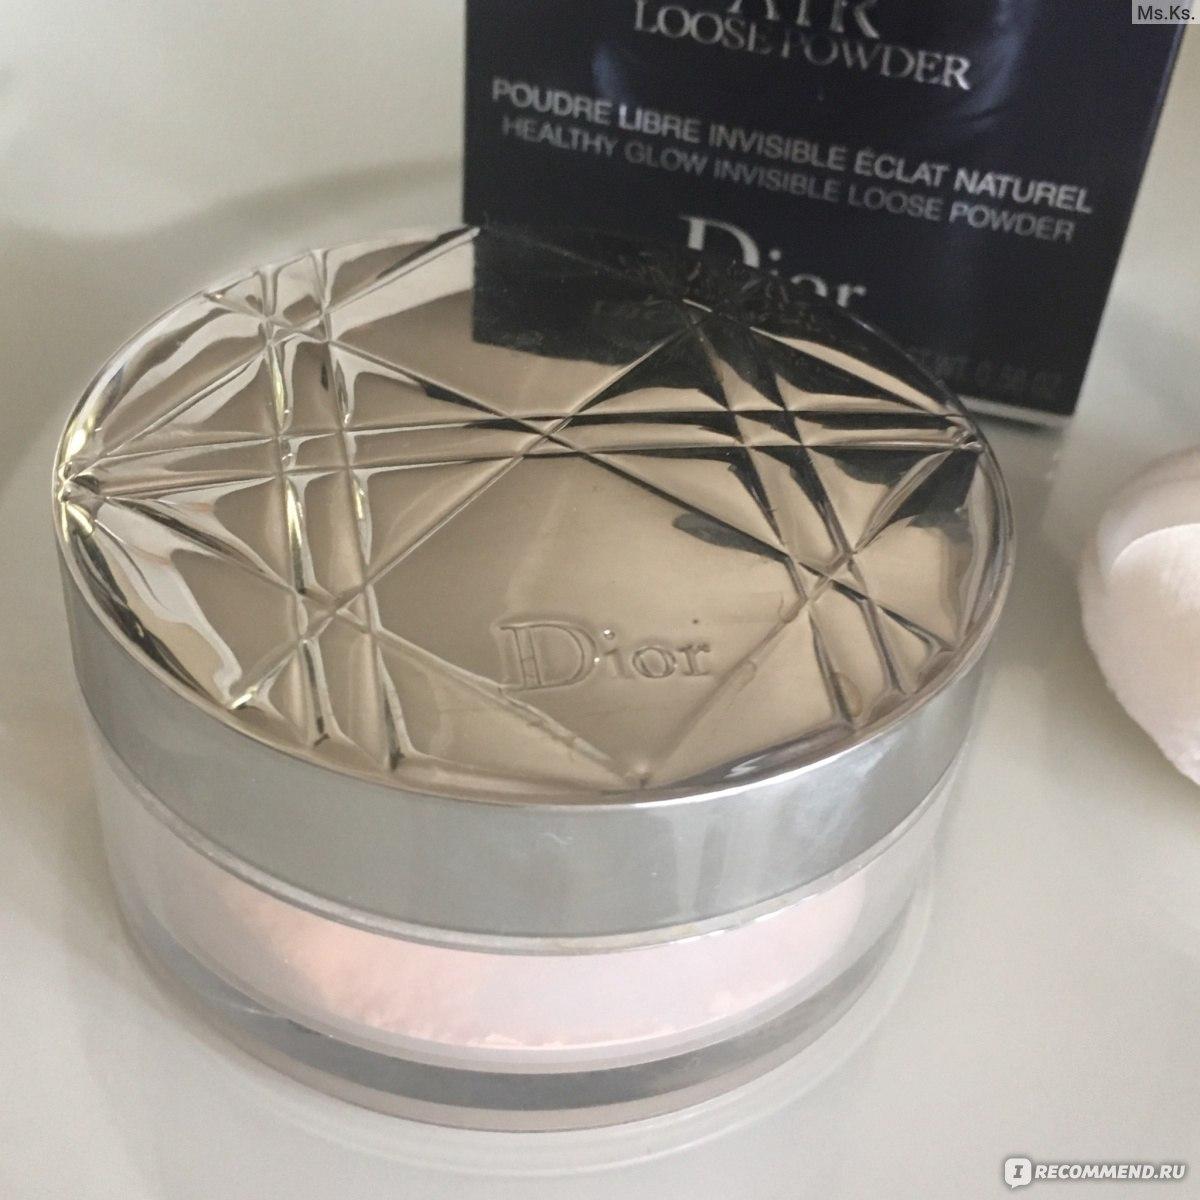 Отзывы о Осветляющая пудра для лица - Dior Diorskin